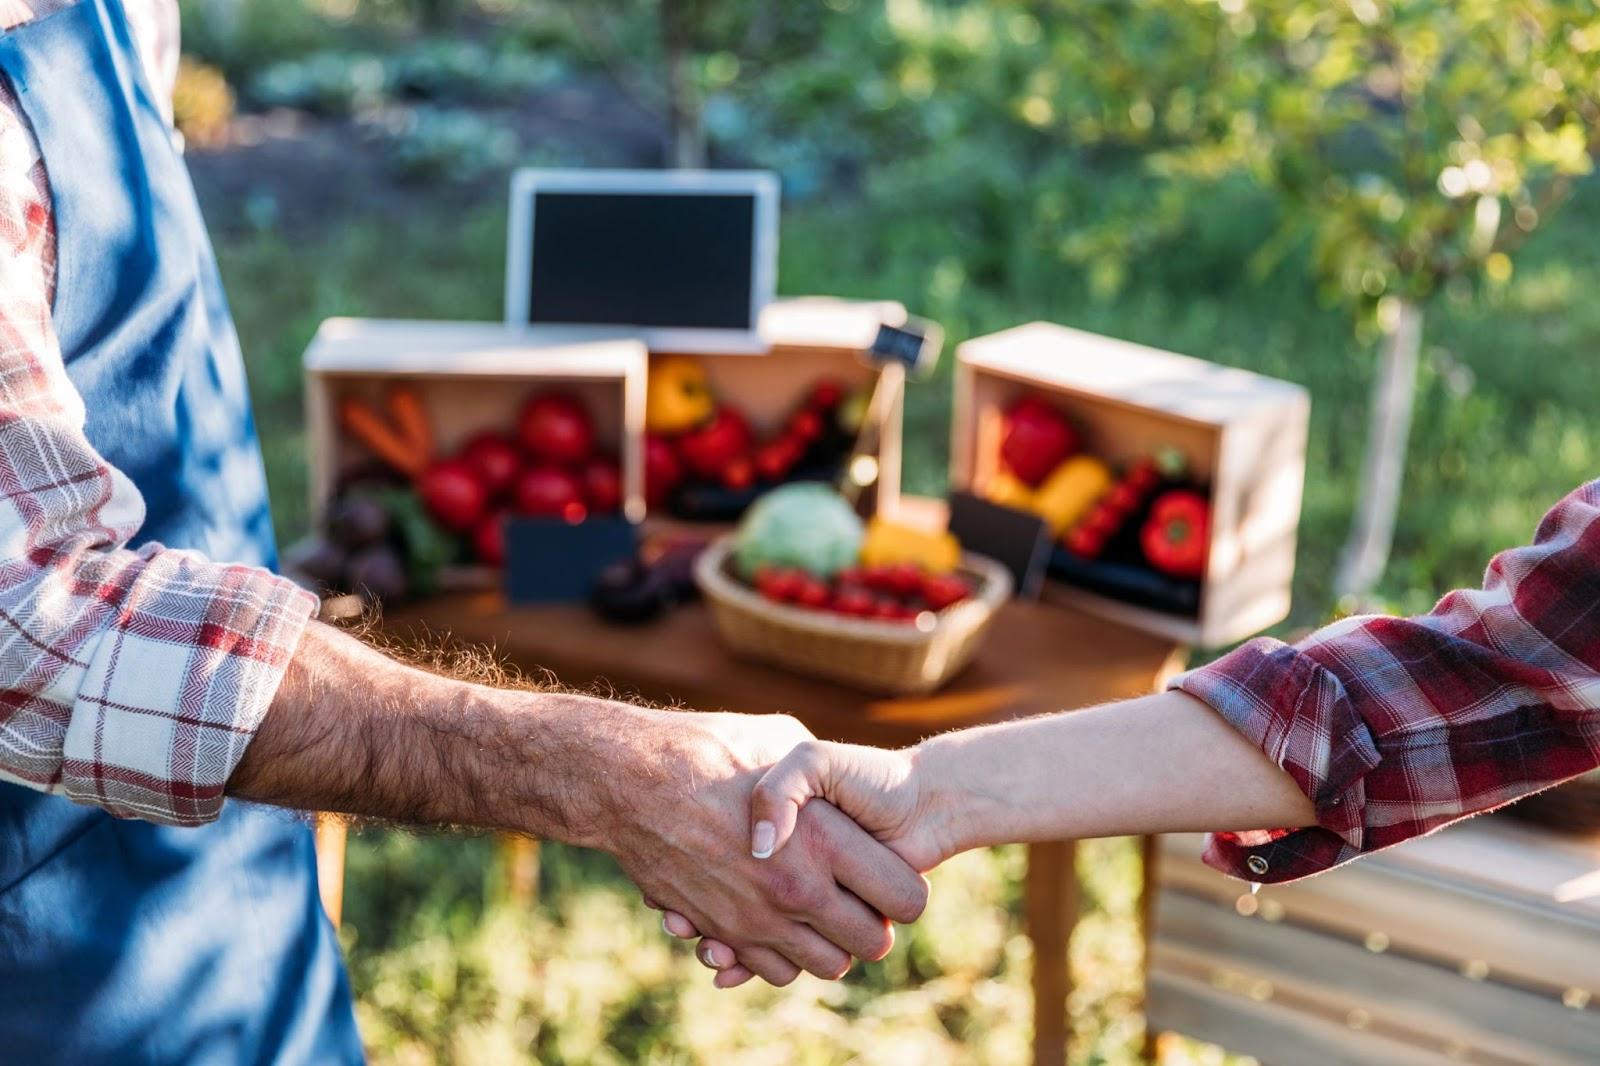 handshake-at-the-farmers-market